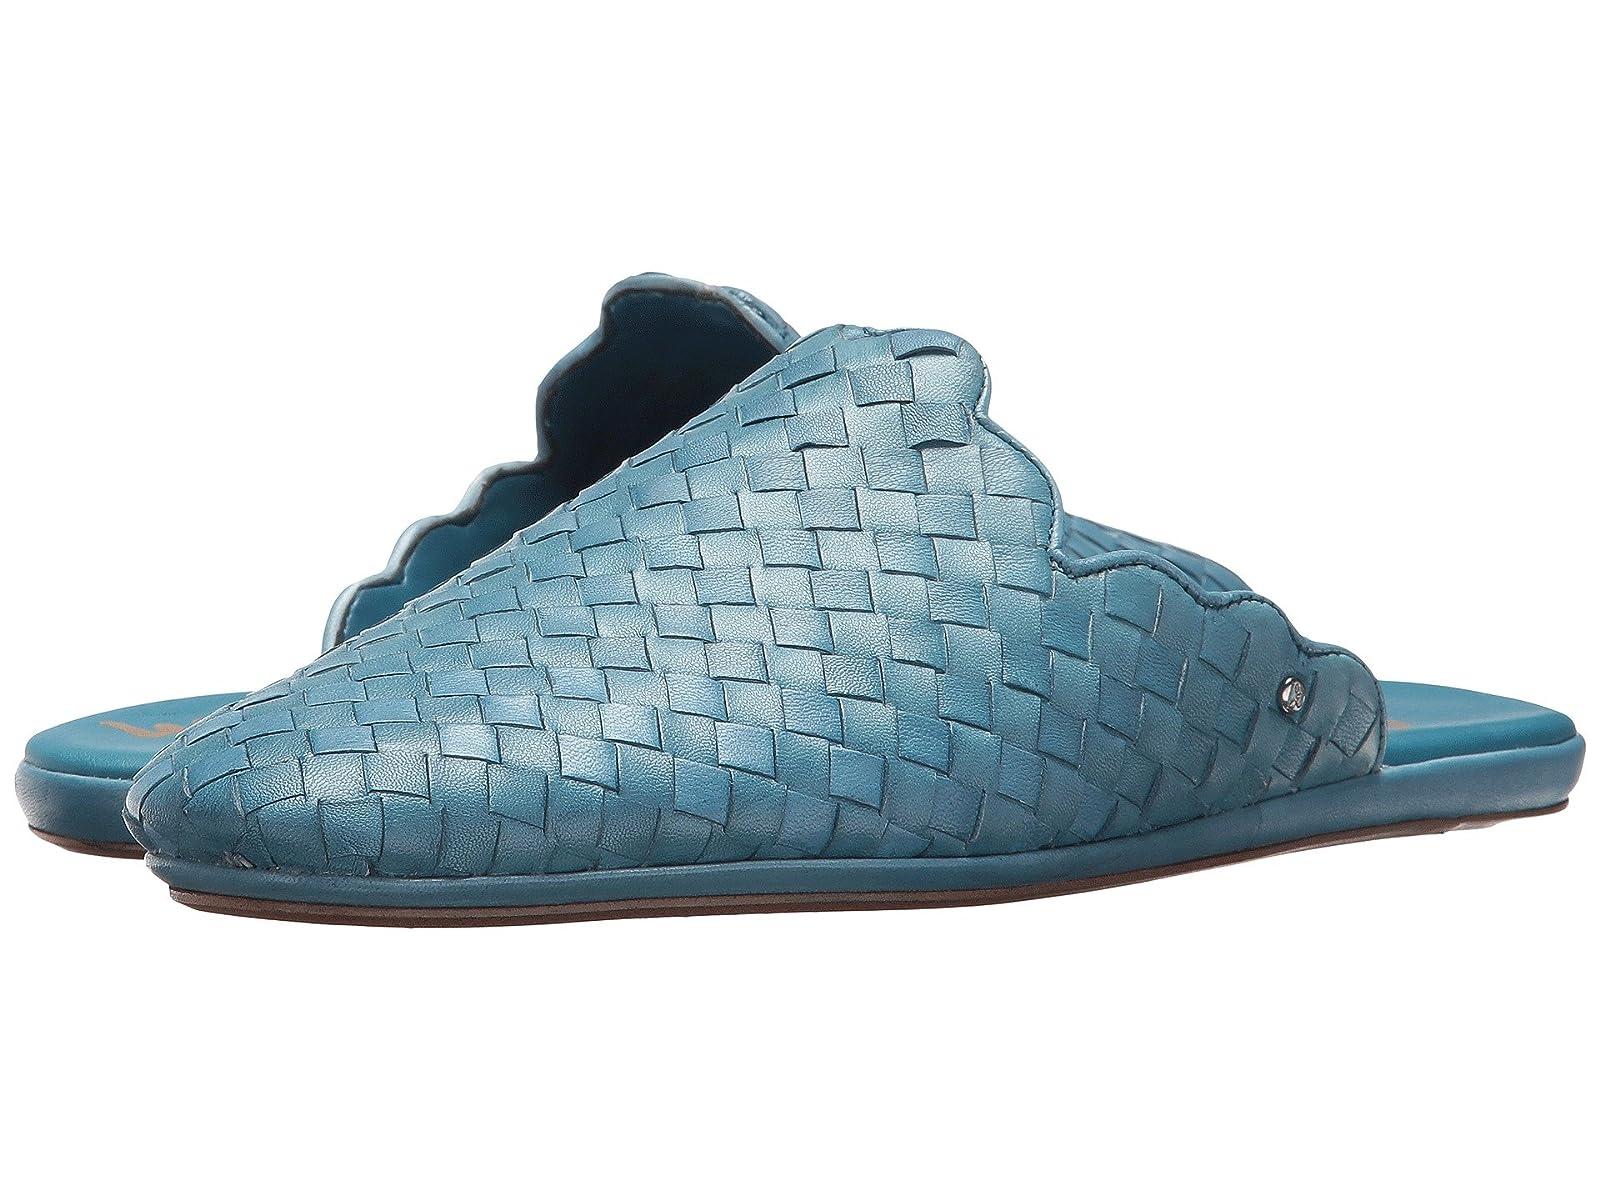 Sam Edelman KatyCheap and distinctive eye-catching shoes